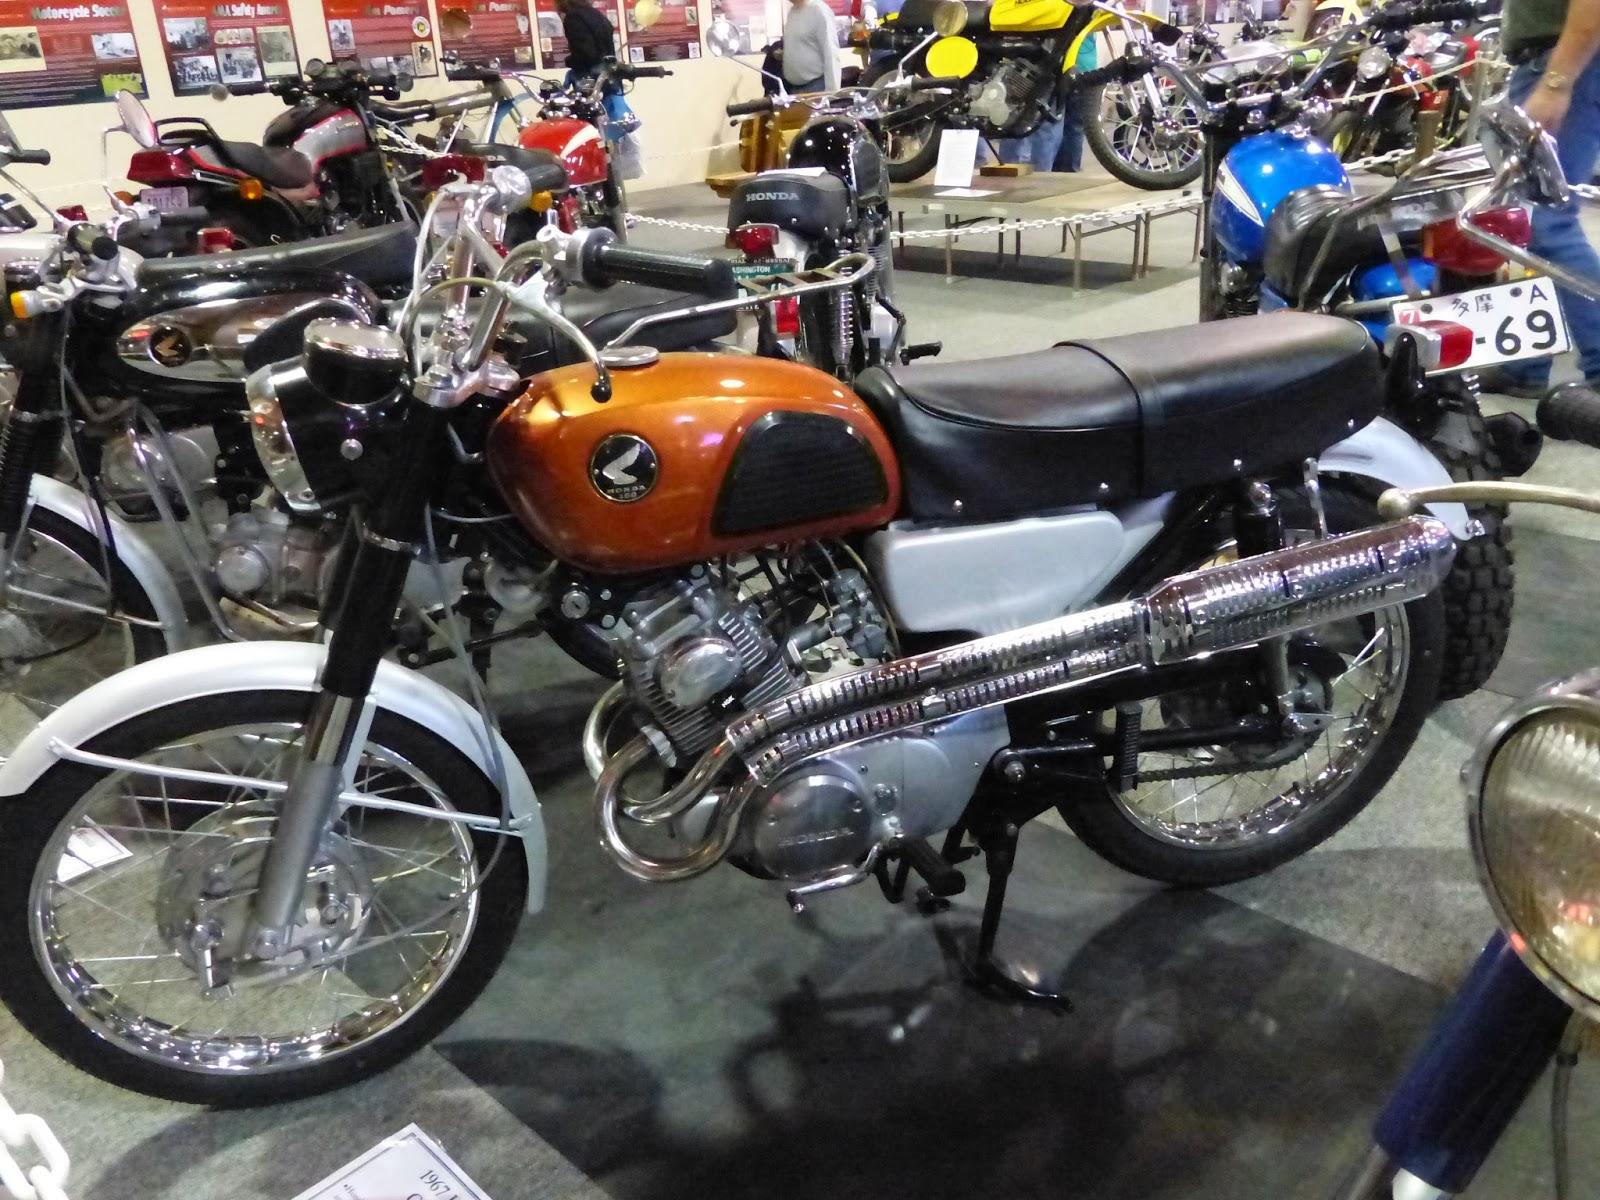 oldmotodude: 1967 honda cl160 on display at the 2016 marymount